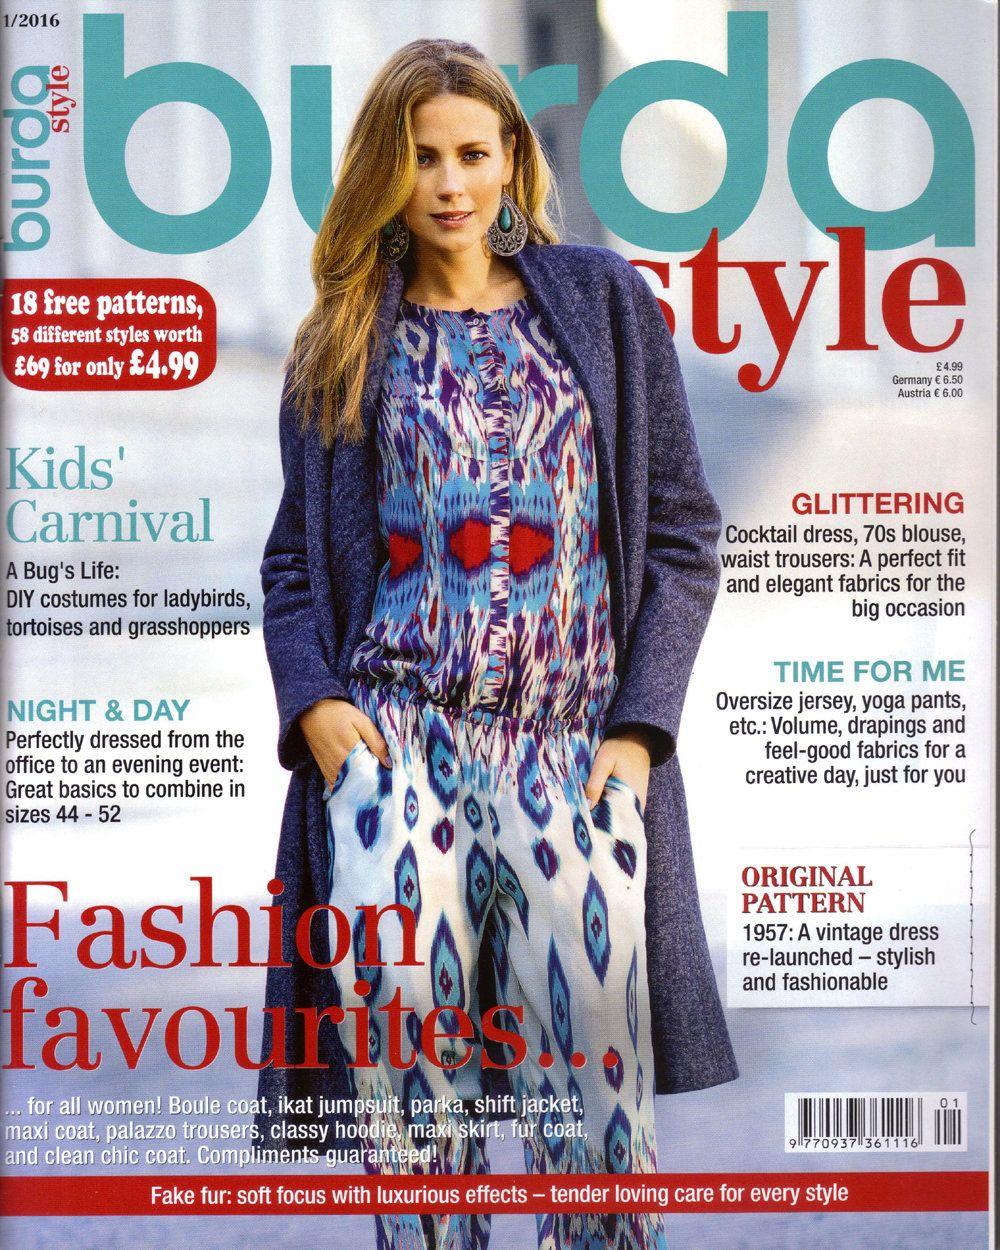 Burda style magazine 12016 english sewing patterns by burda style magazine 12016 english sewing patterns by honeyjamsuniques on etsy jeuxipadfo Image collections